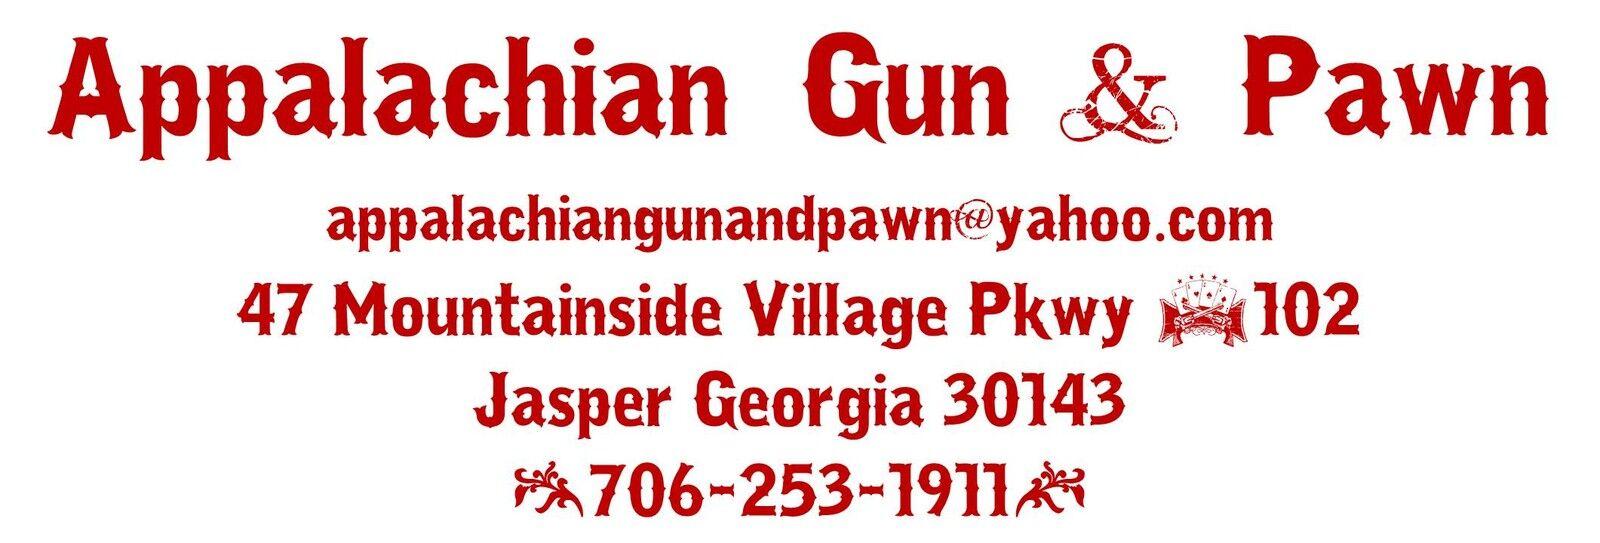 Appalachian Gun